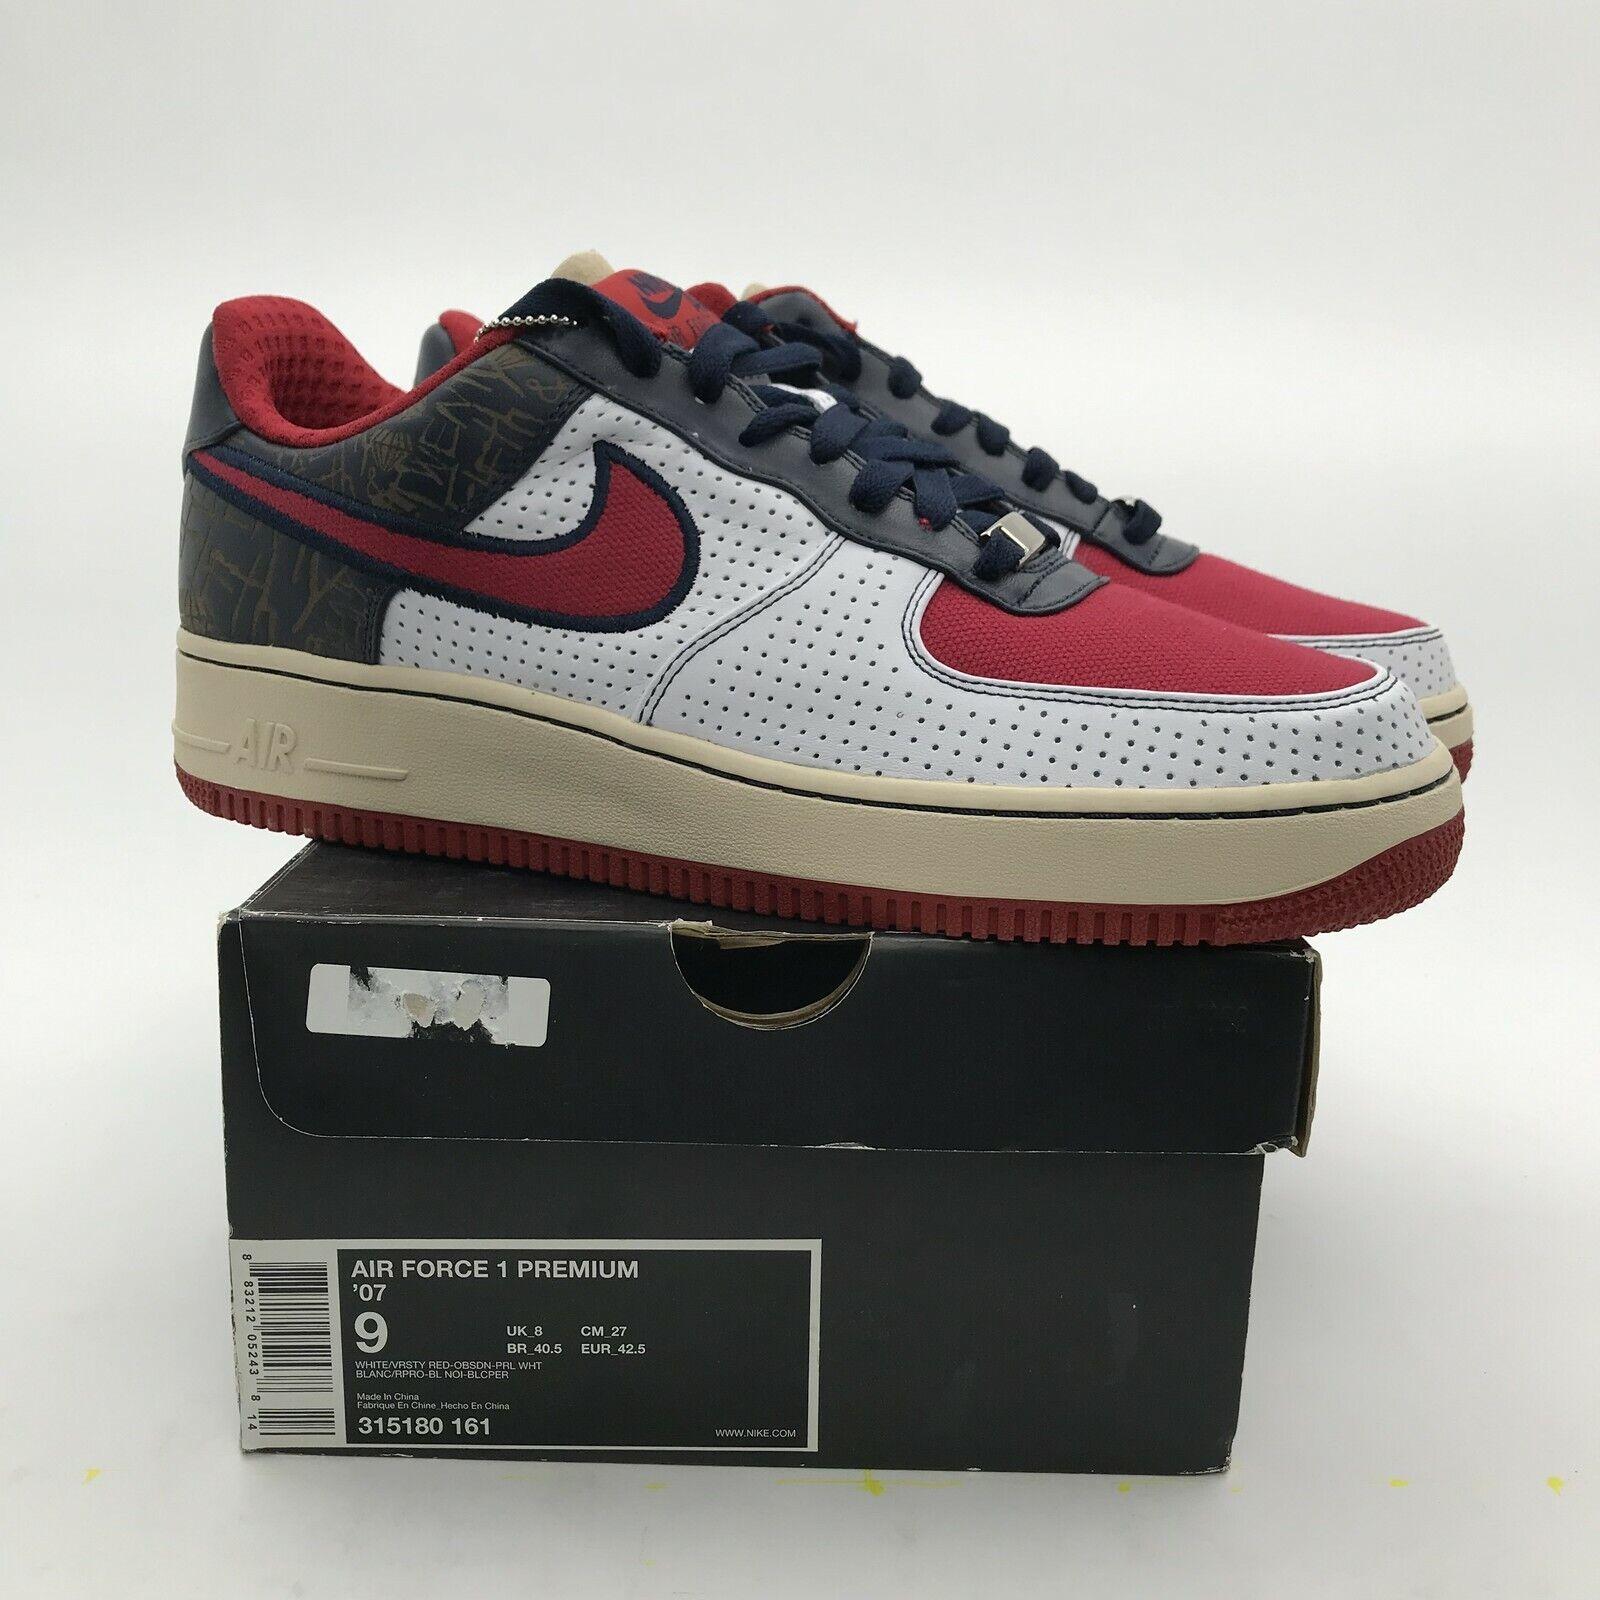 2007 Nike Air Force 1 Low Premium '07 White Varsity Red NEW 315180-161 US 9